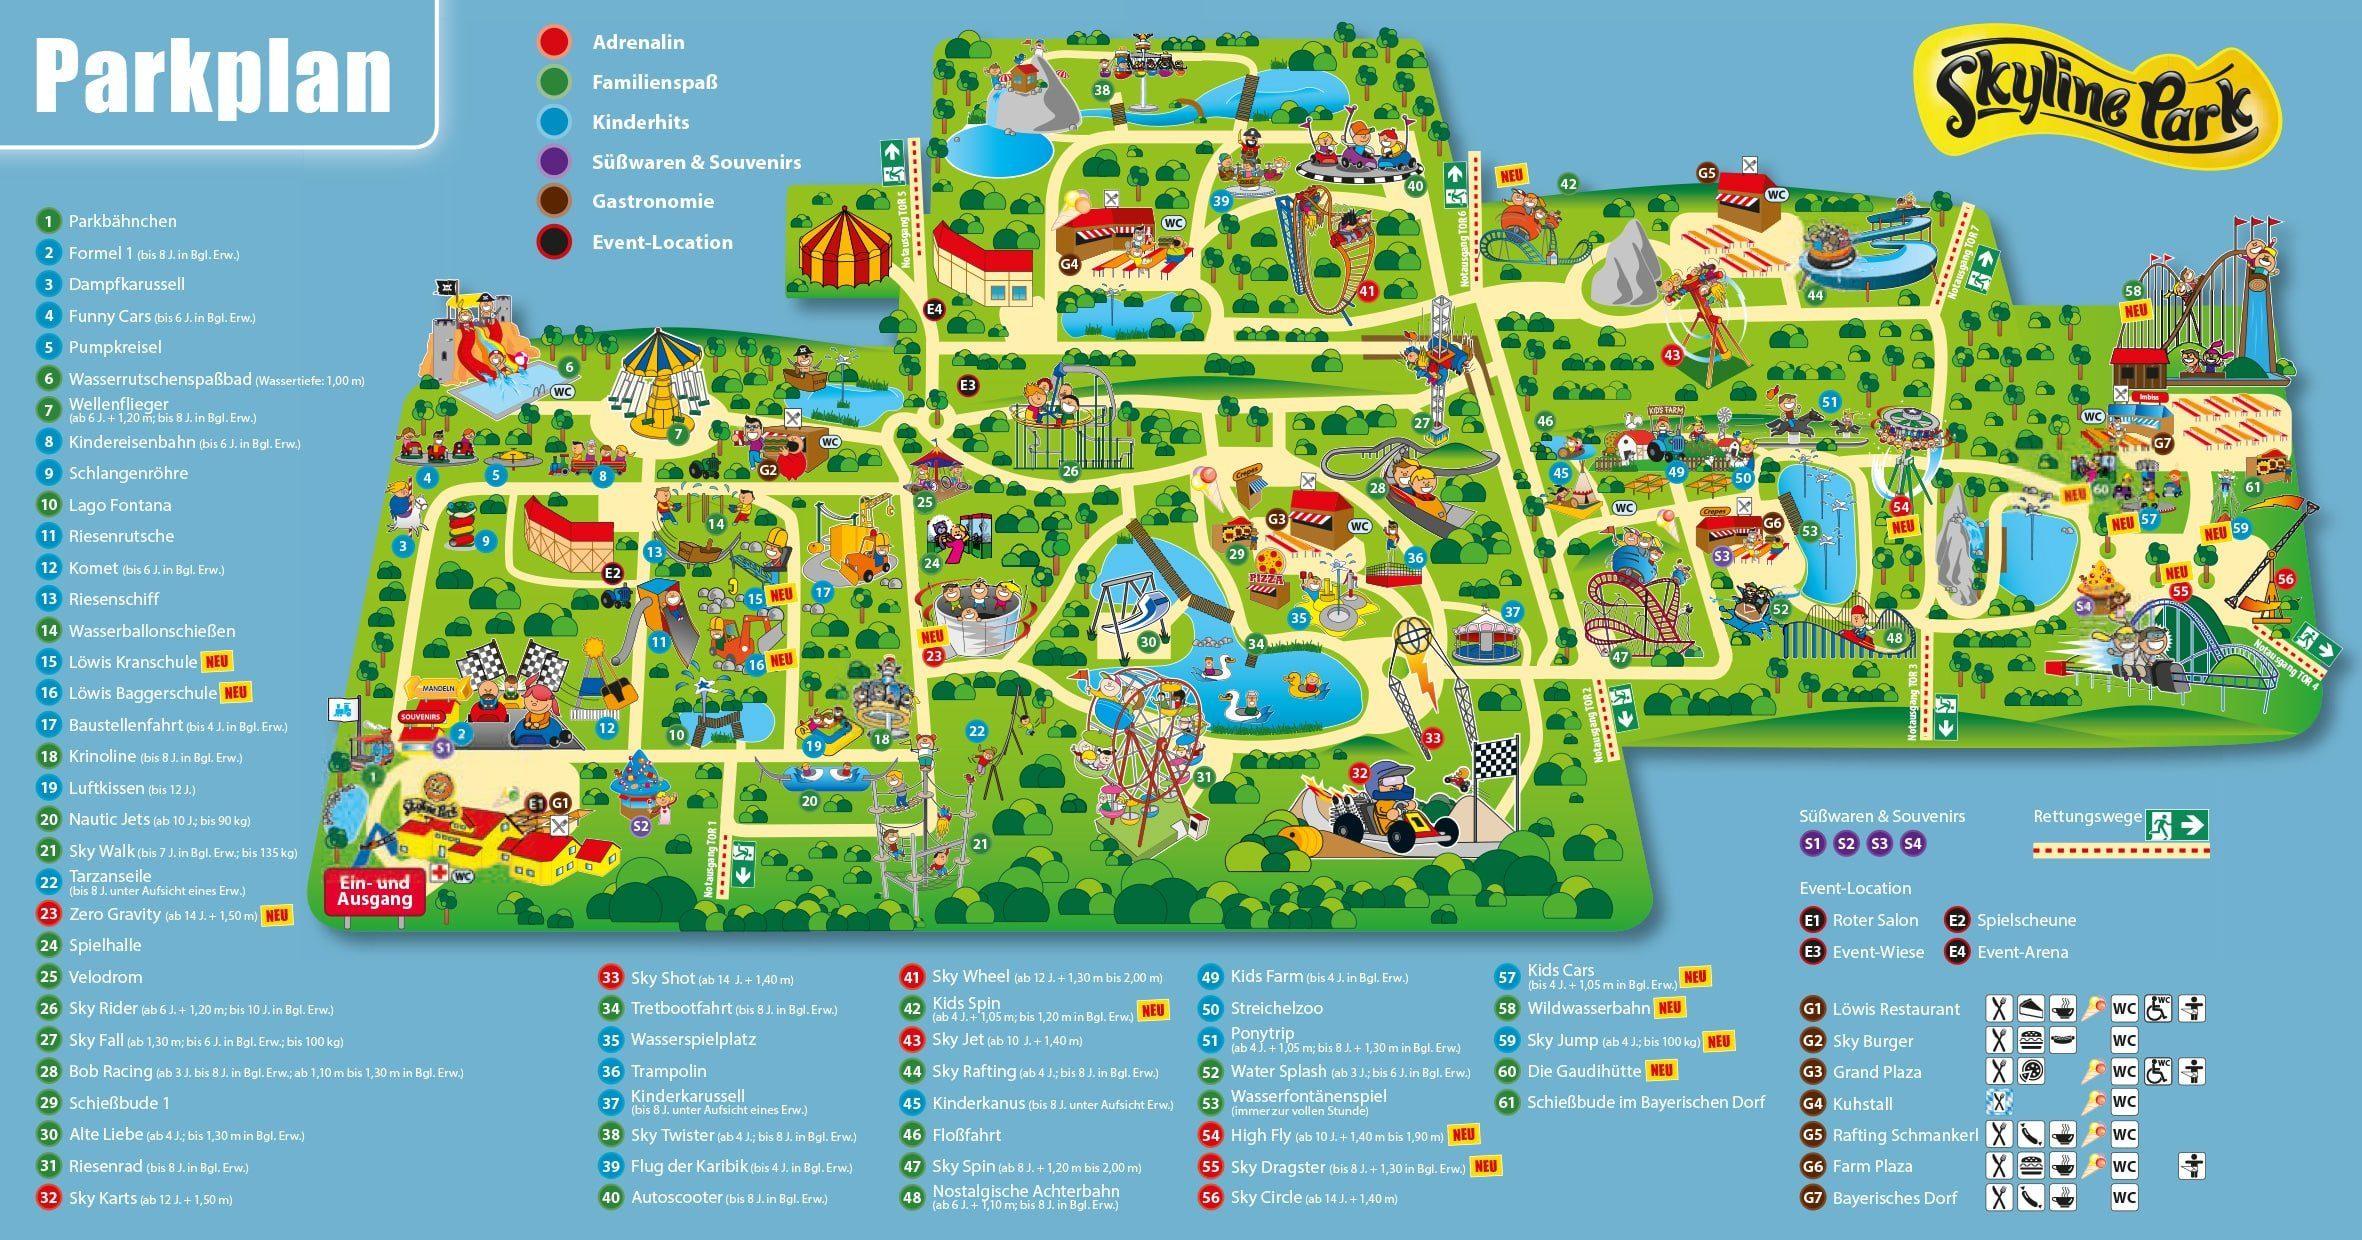 Parkplan Allgäu Skyline Park